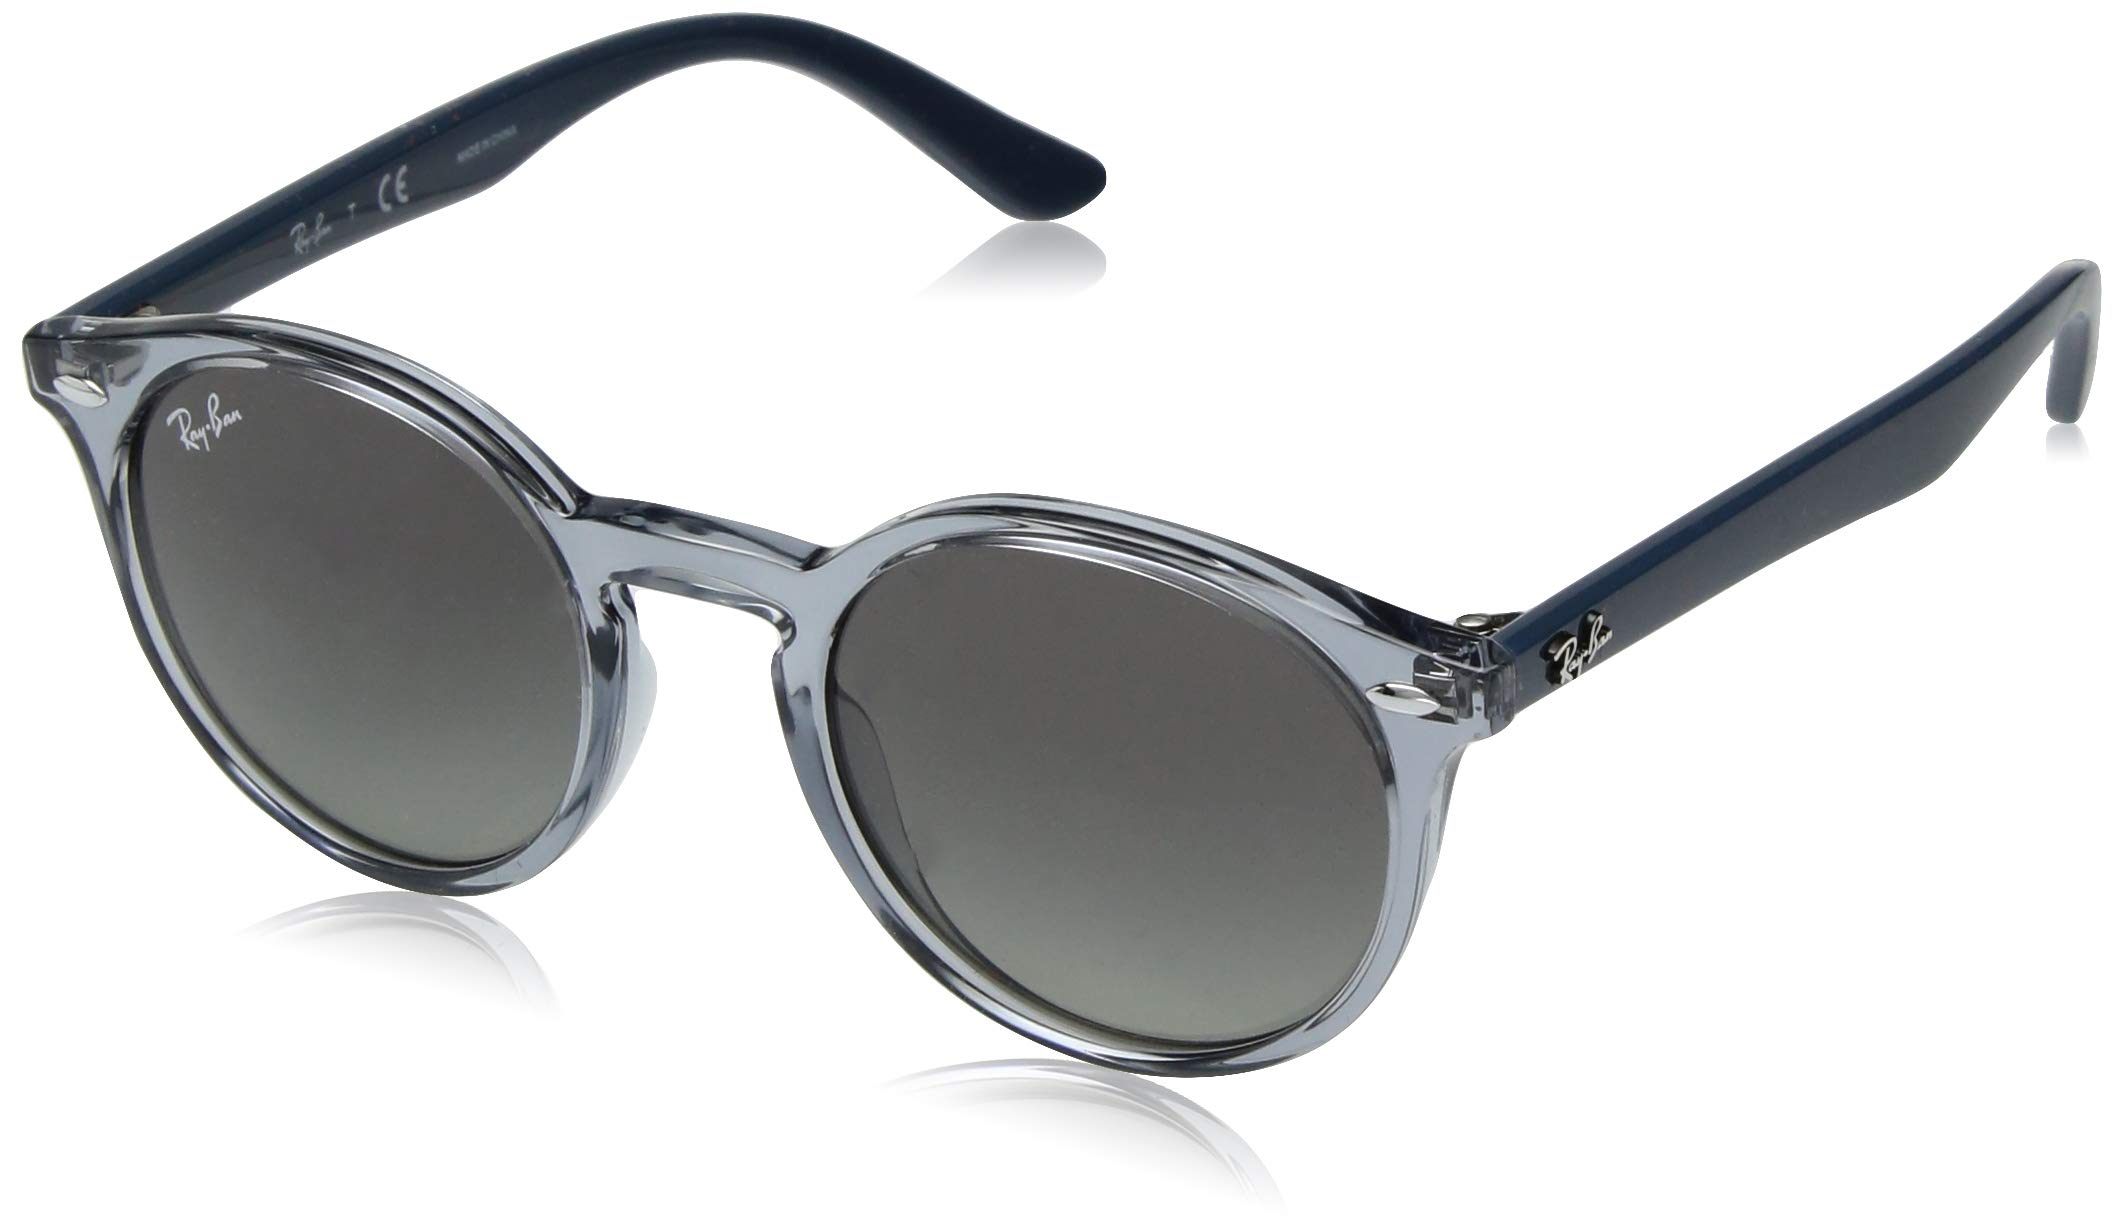 Ray-Ban Junior RJ9064S Round Kids Sunglasses, Transparent Blue/Grey Gradient, 44 mm